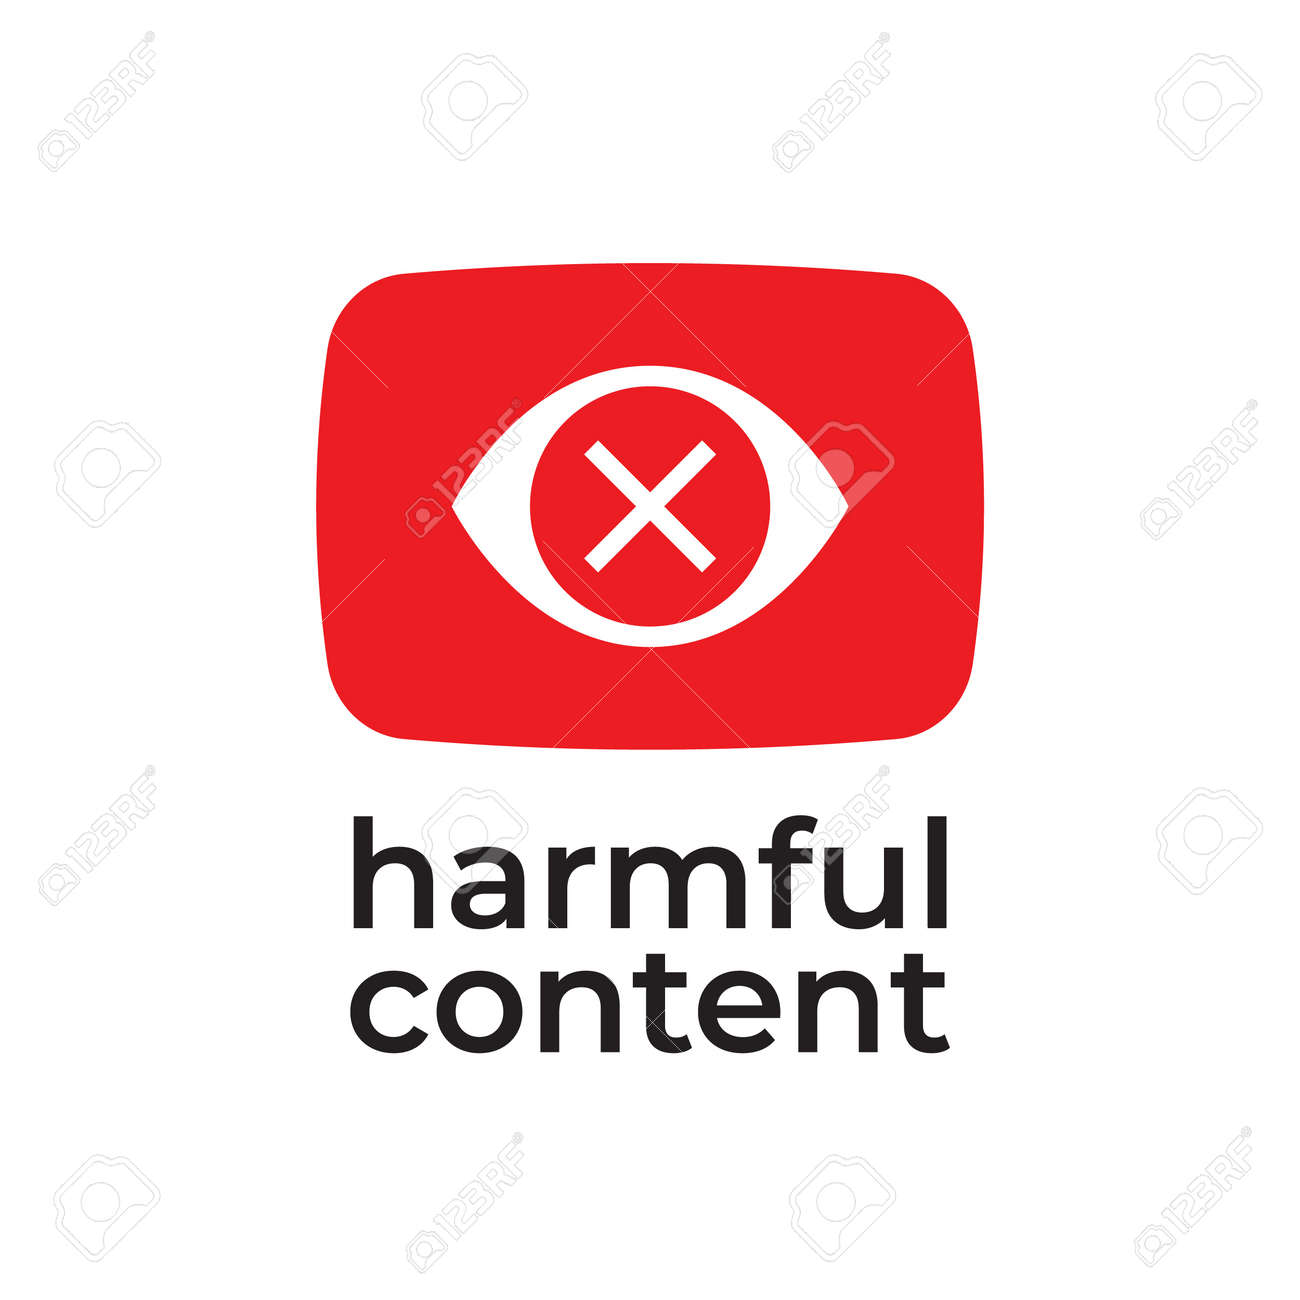 Parental control icon, vector clip art. Harmful content. Warning sign, notice, danger sign. Social problem. - 163226511